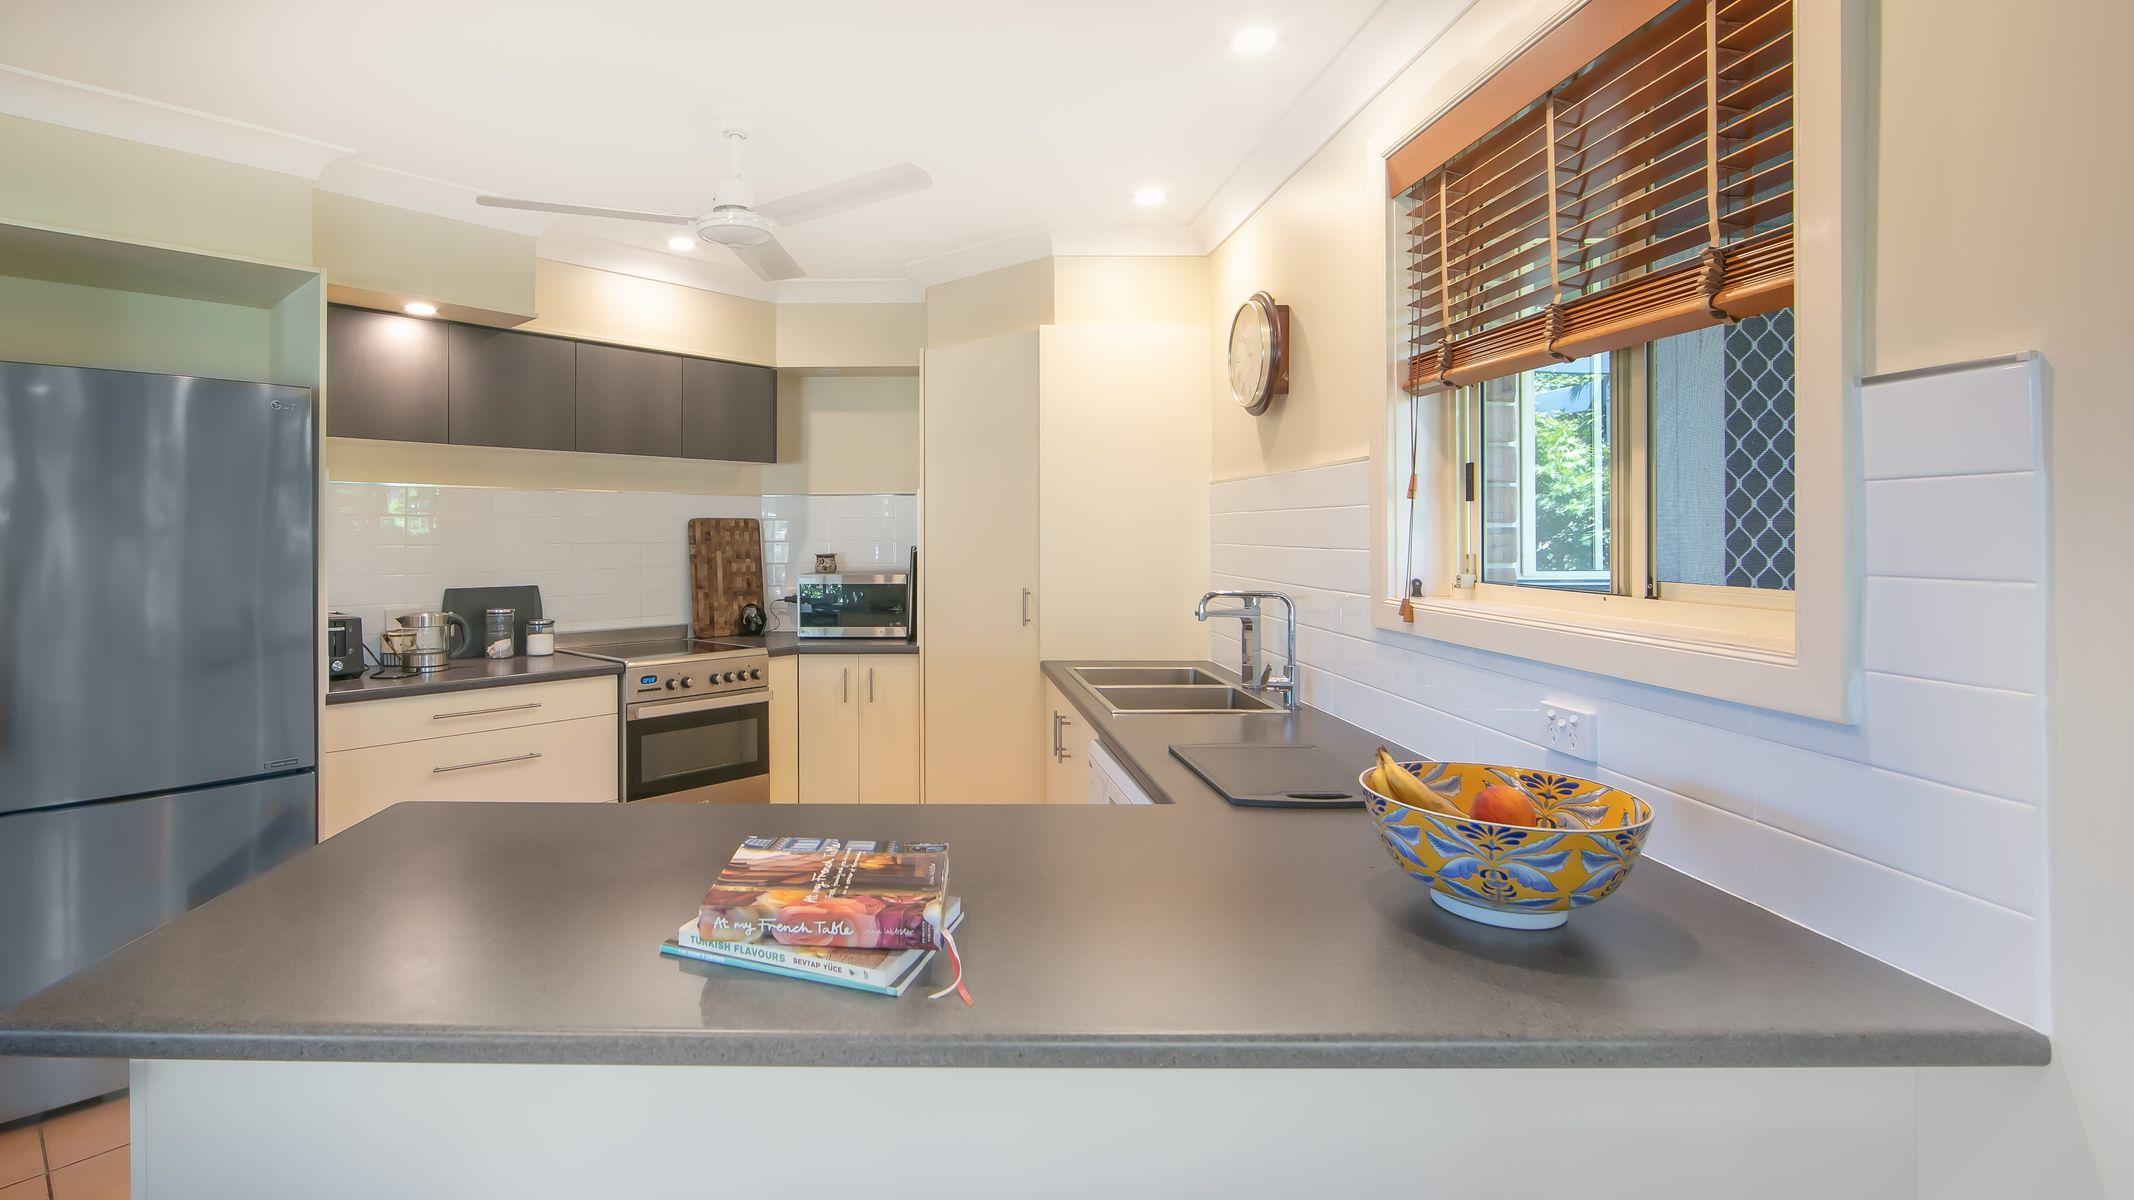 2 Kookaburra Court, Yamba, NSW 2464